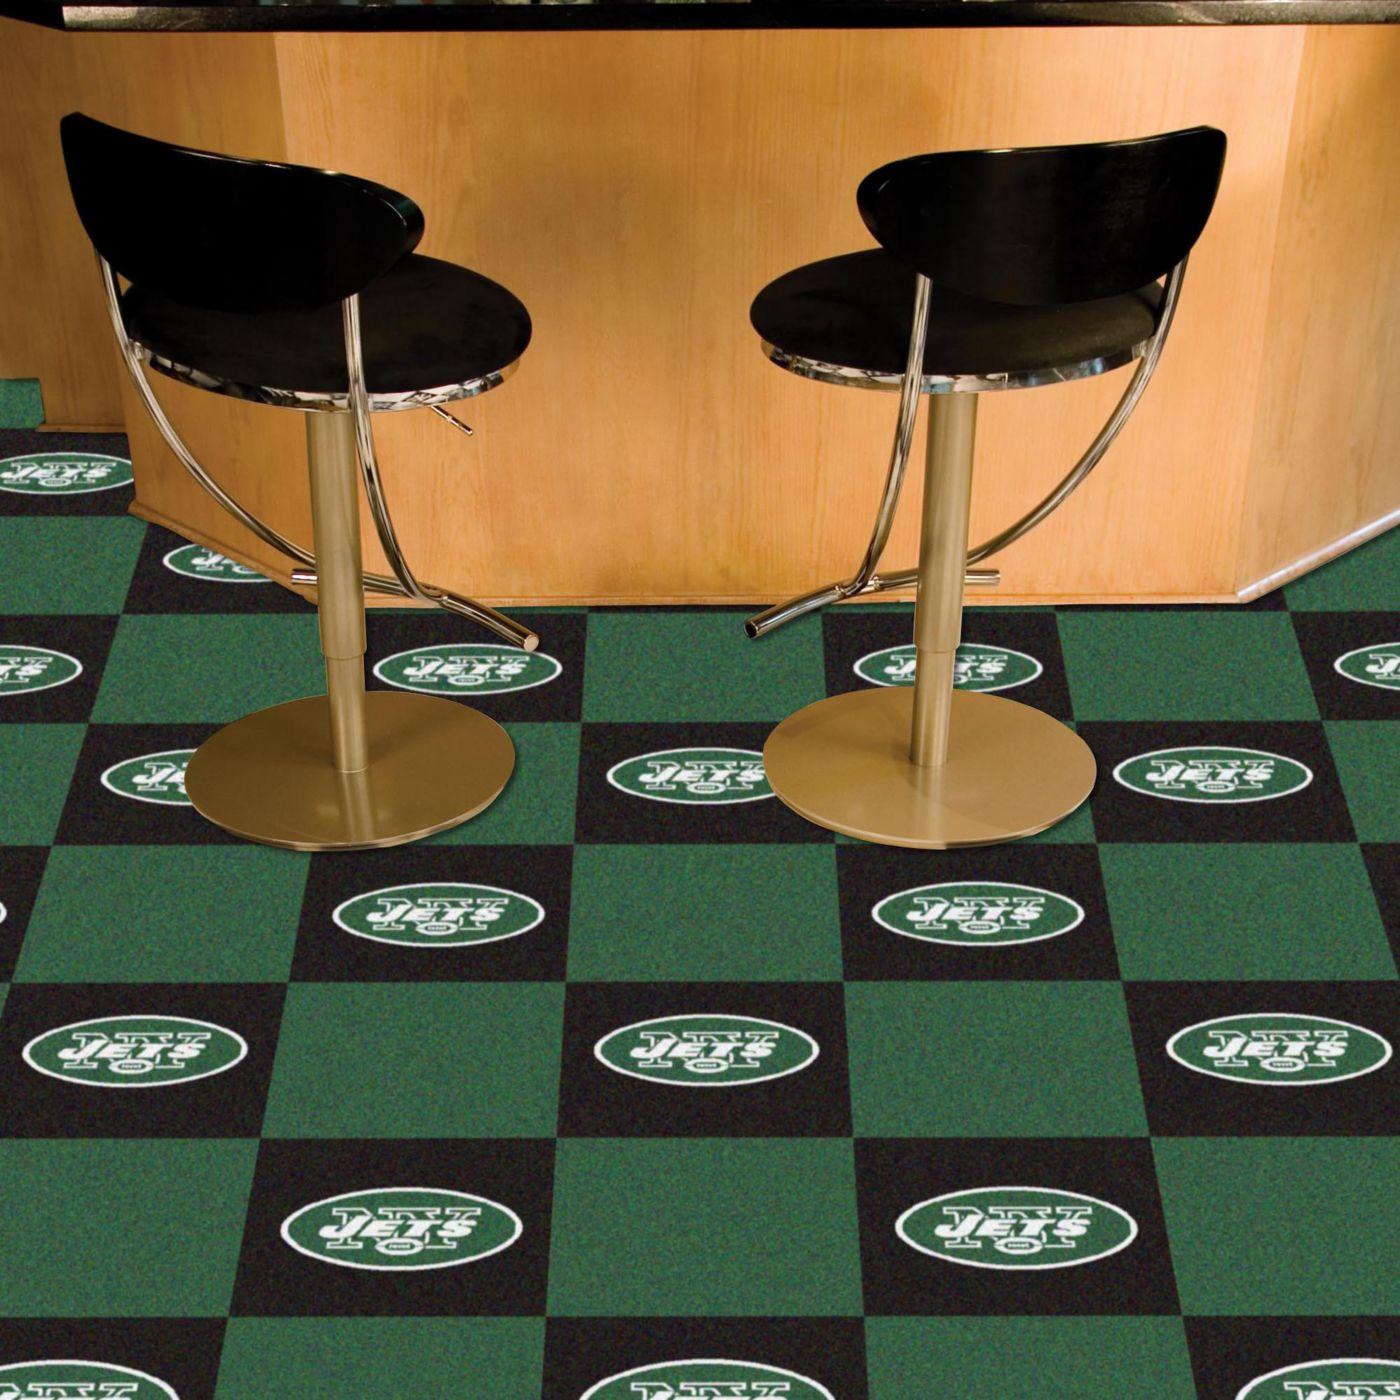 FANMATS New York Jets Team Carpet Tiles